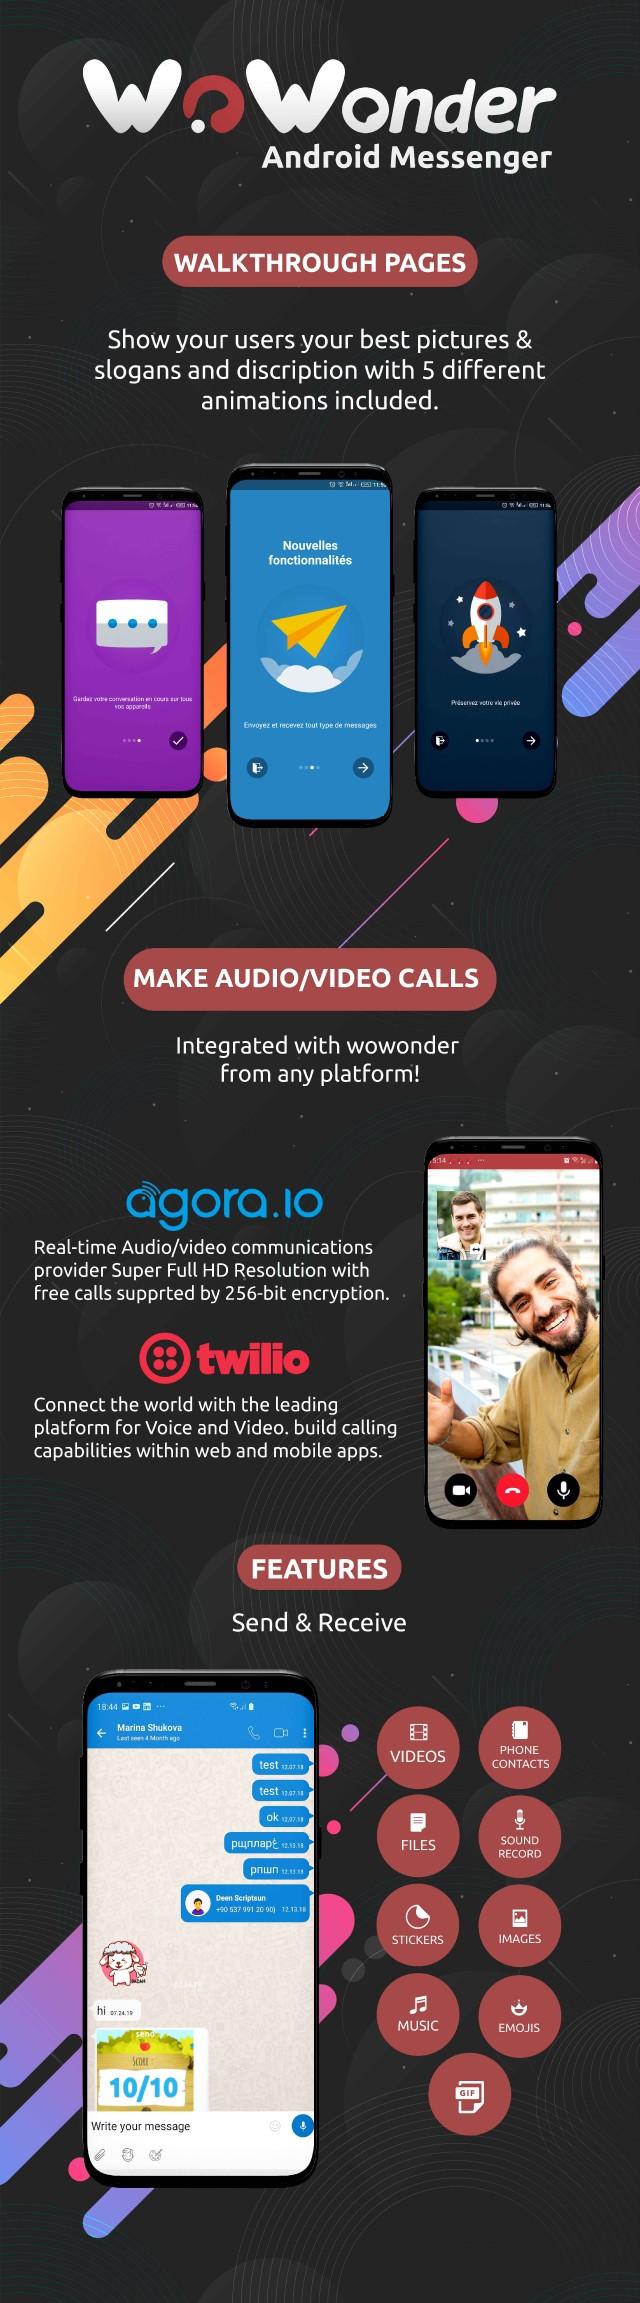 WoWonder Android Messenger - Mobile Application for WoWonder Social Script